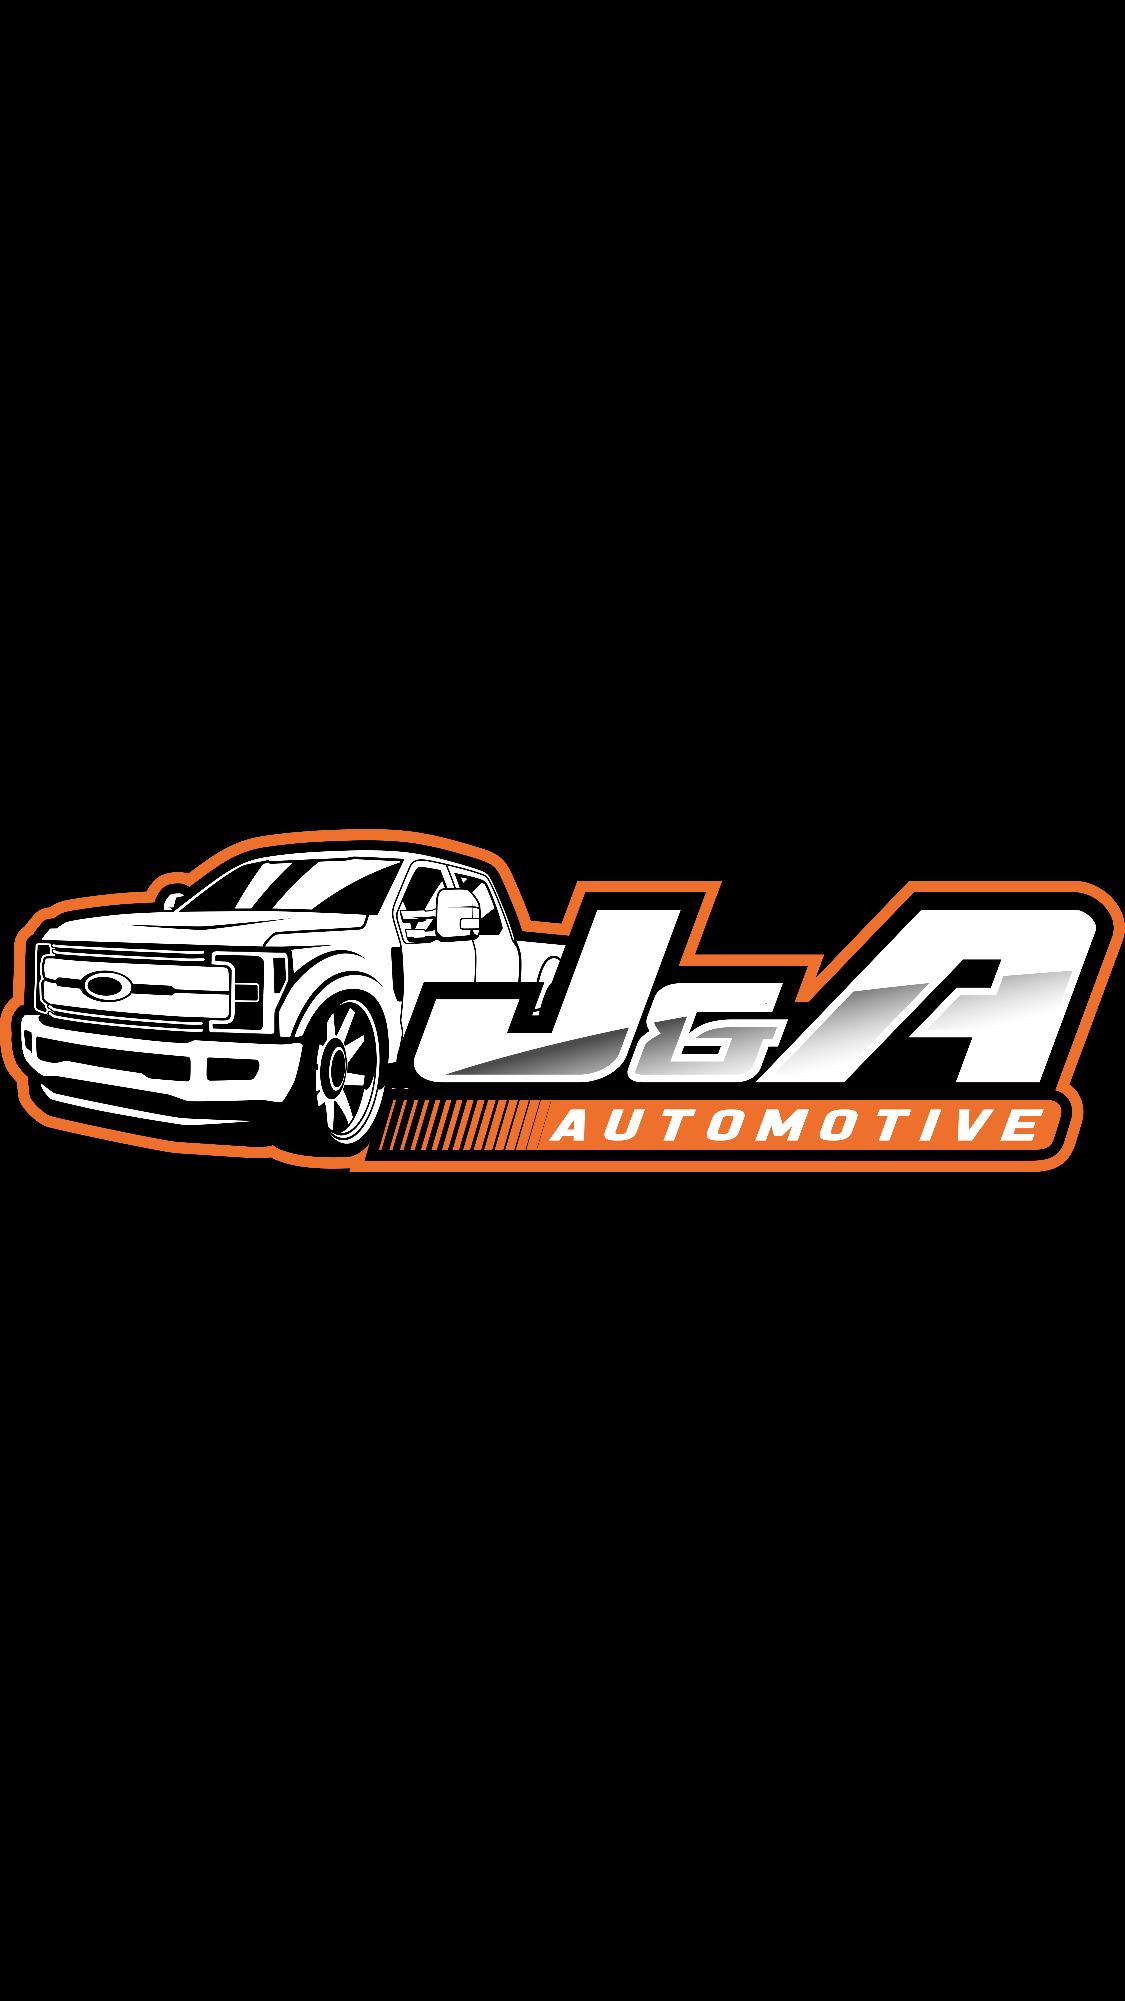 Pin By J A Automotive On J A Automotive Vehicle Logos Chevrolet Logo Logos